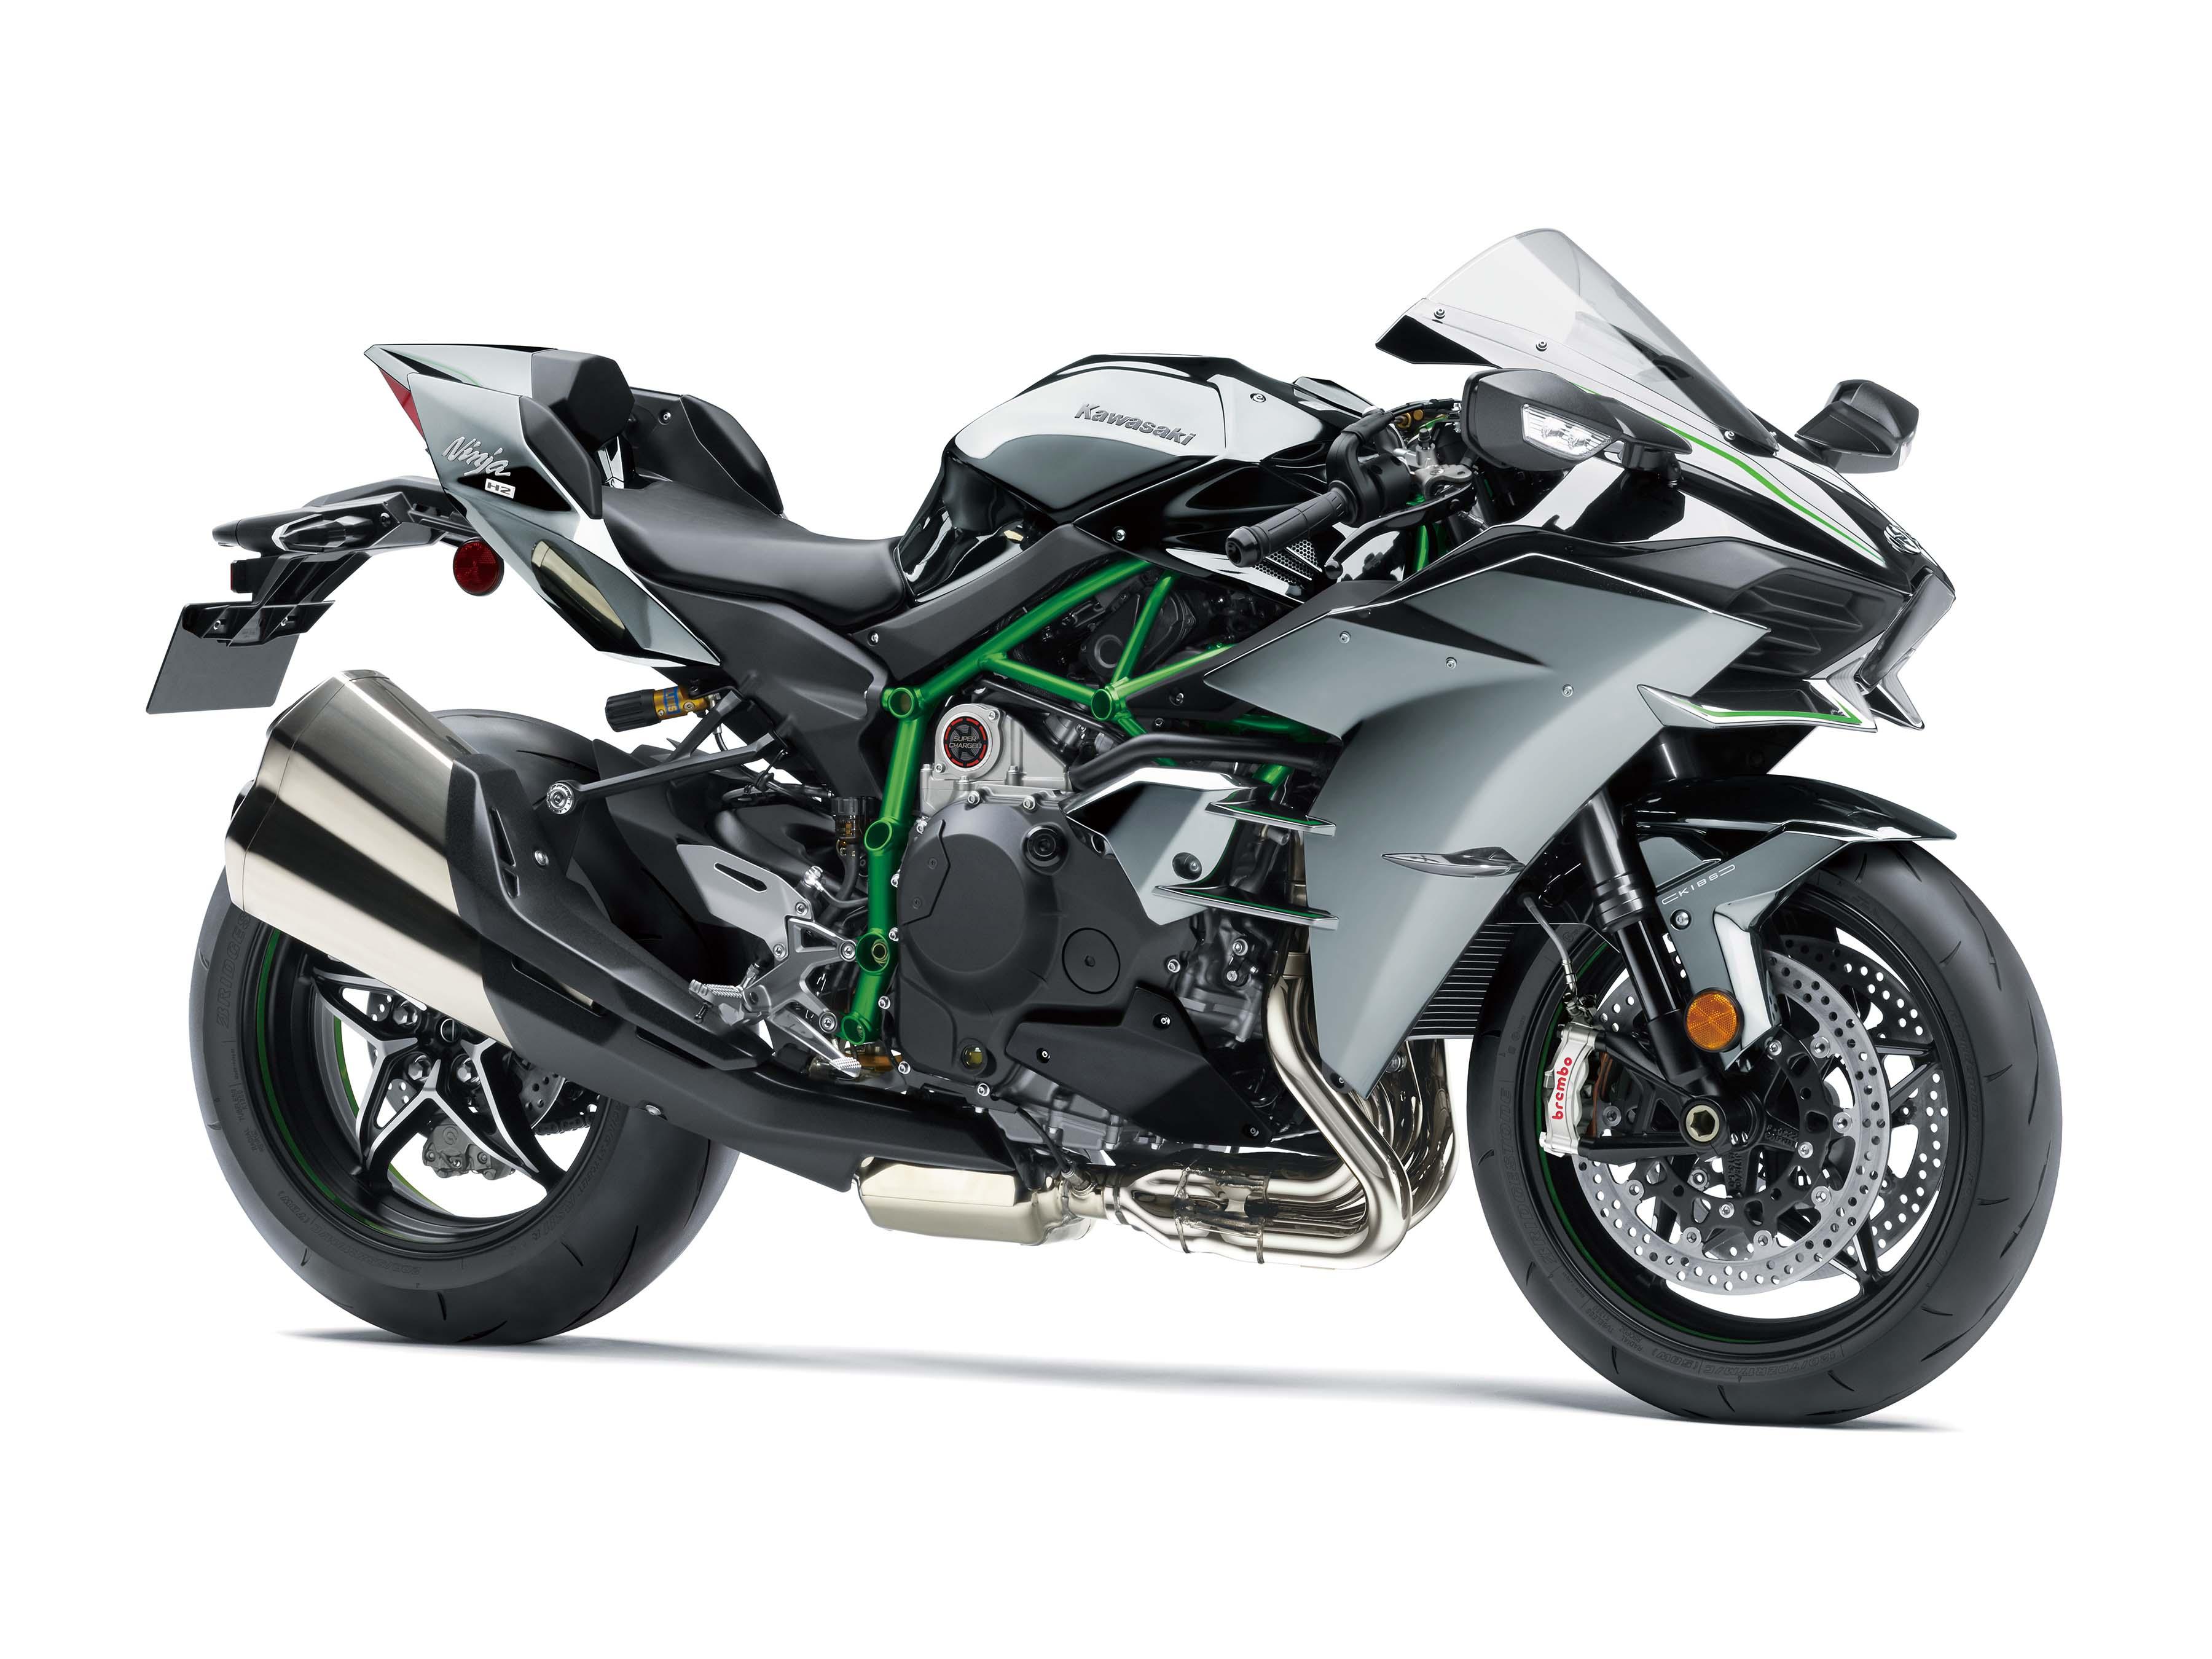 Kawasaki Ninja H2 Gets Updates & More Power for 2019